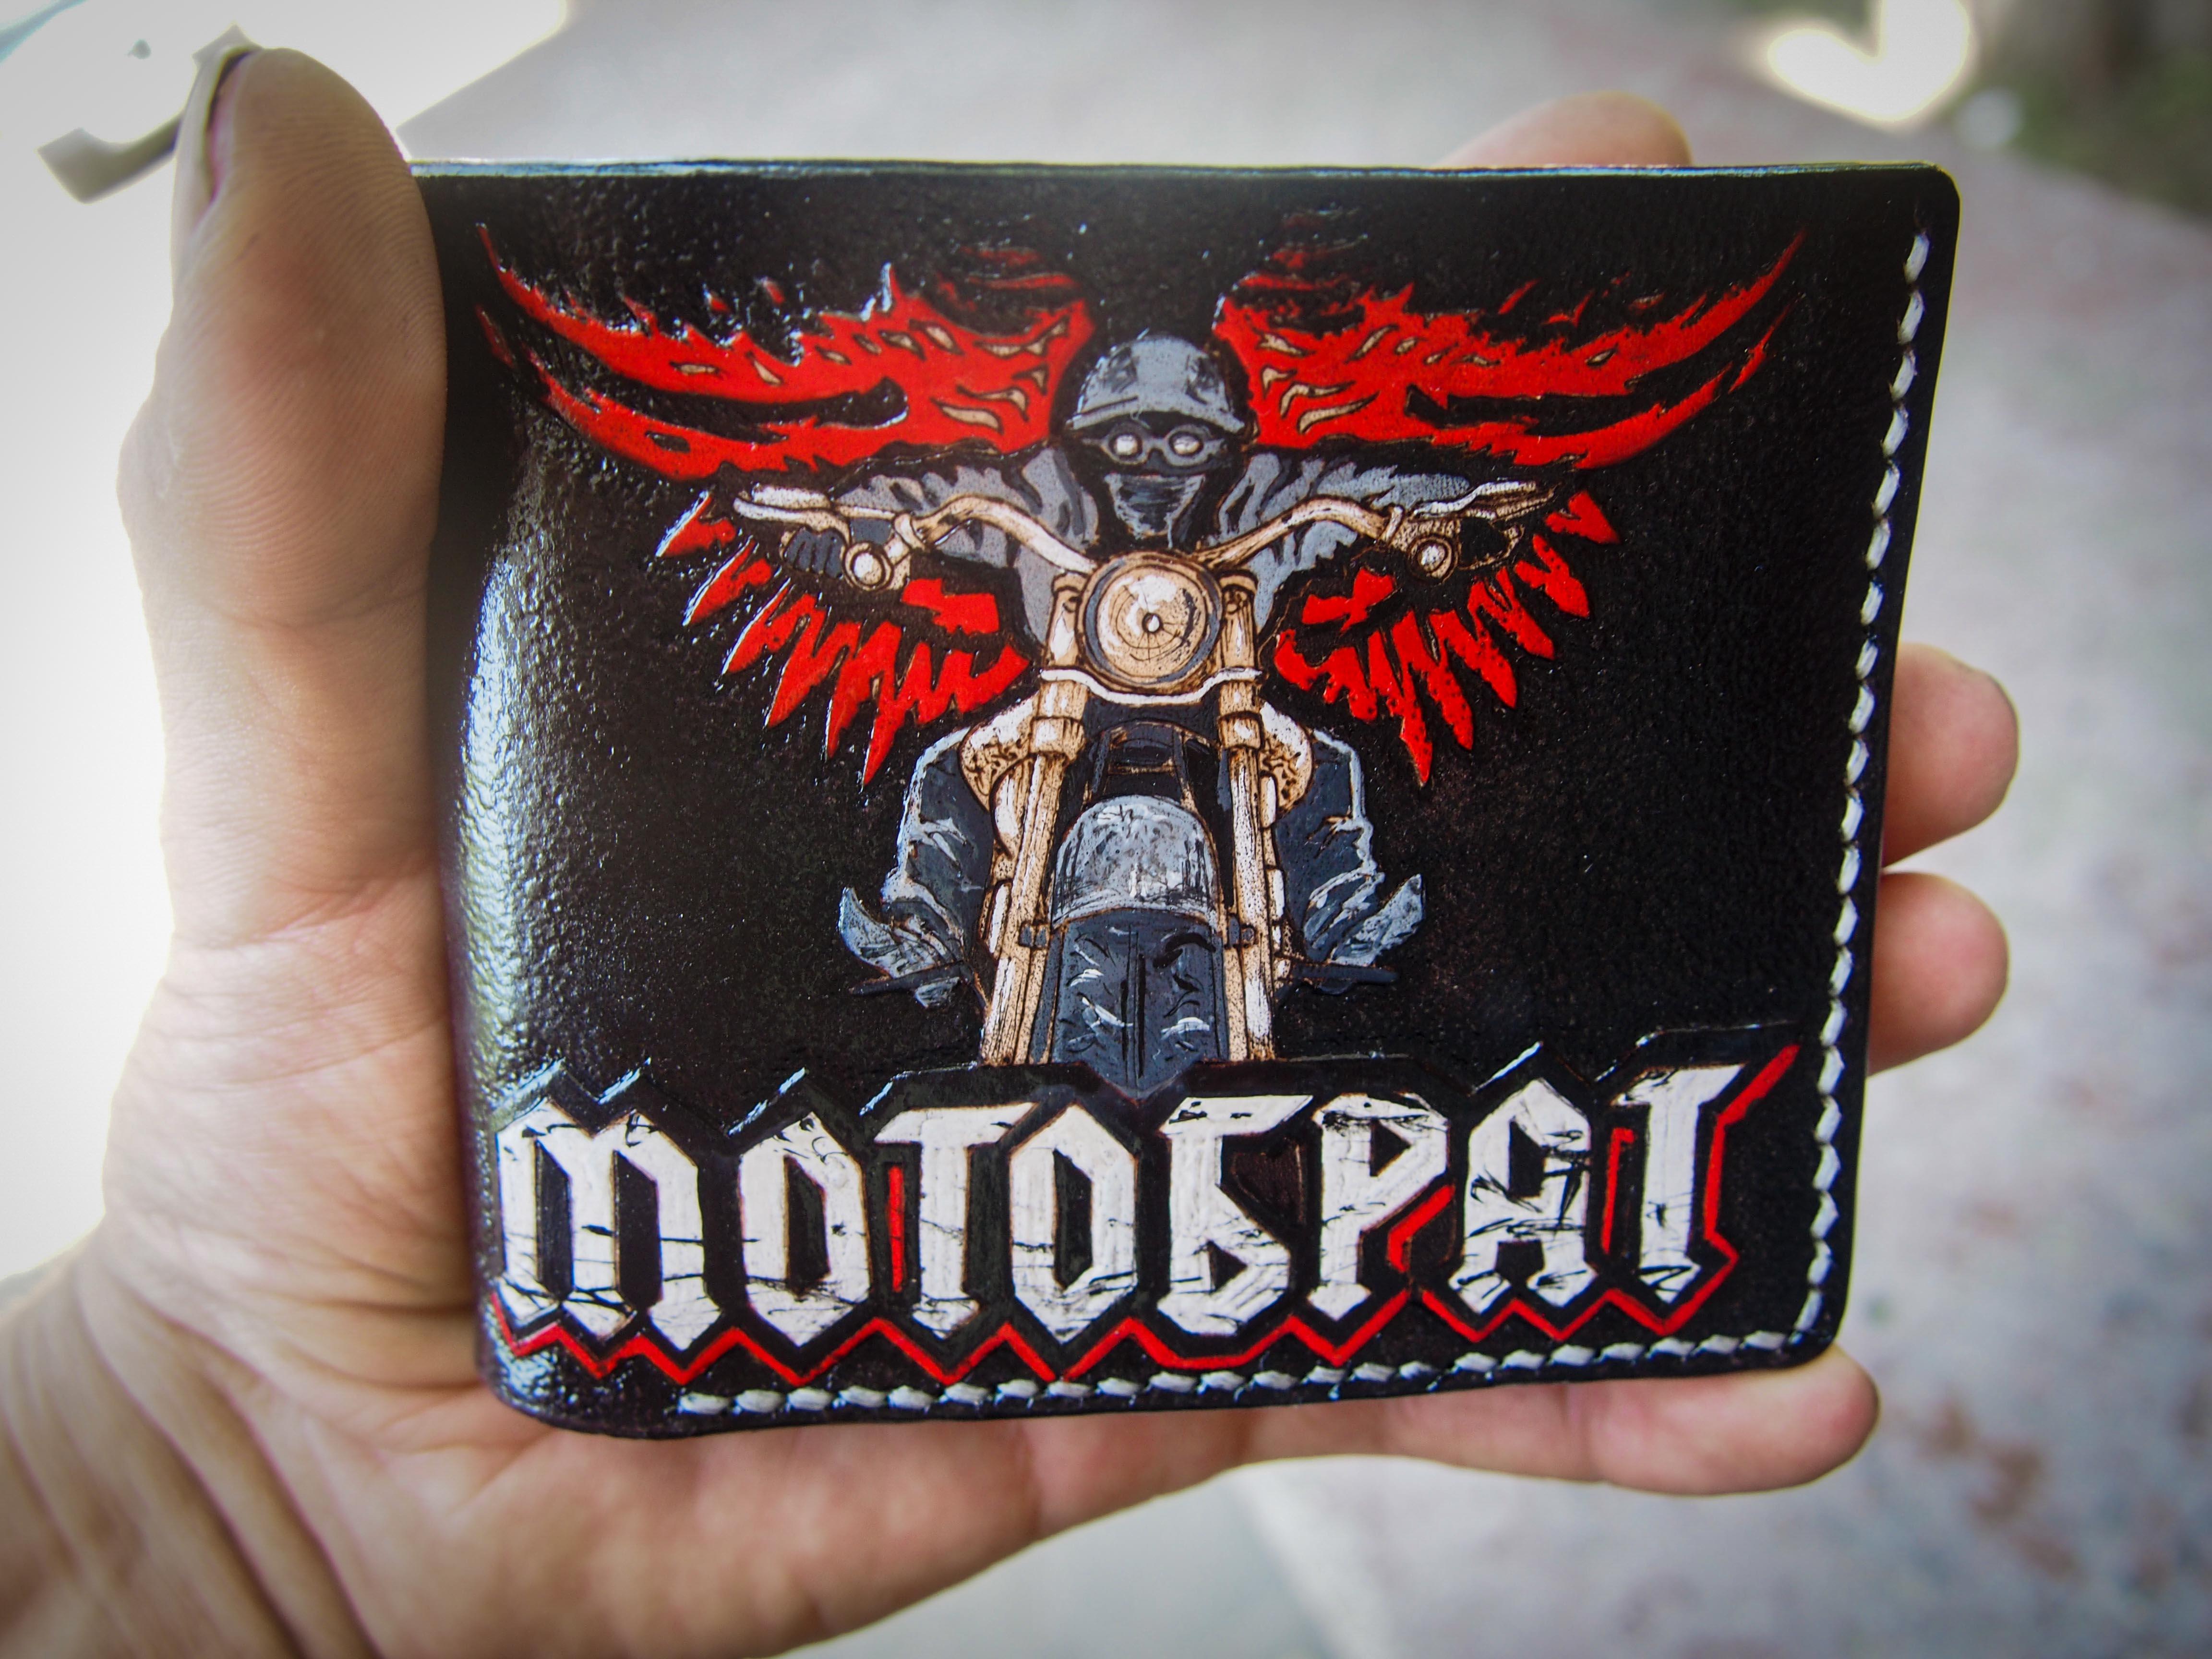 Коженый кошелек с логотипом мото-клуба фото 9